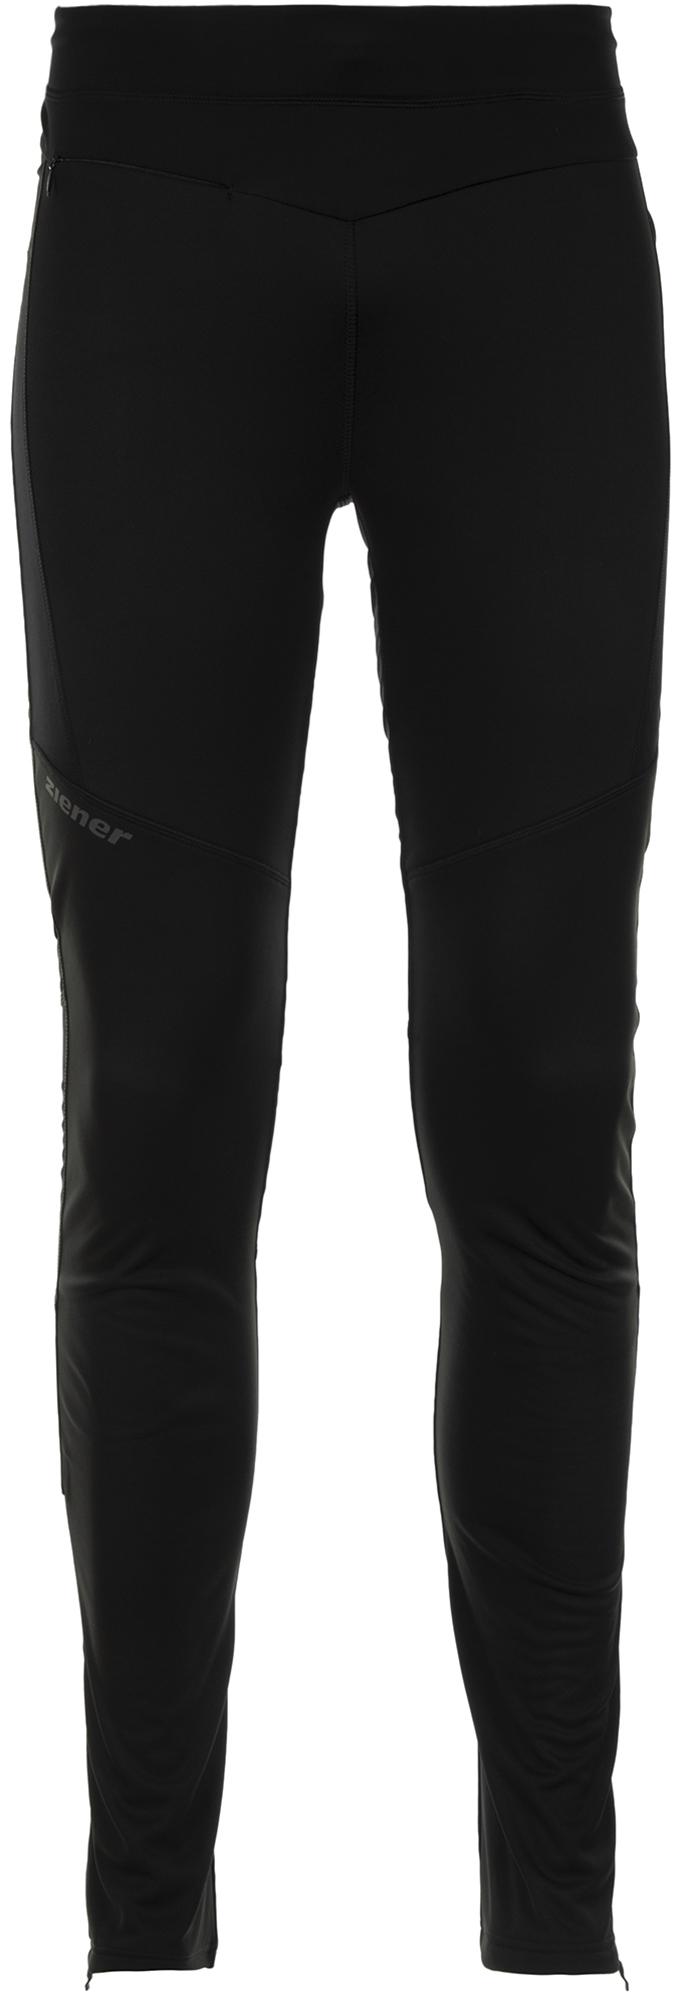 Ziener Брюки мужские Ziener Nataniel, размер 54 брюки мужские sela цвет темно серый меланж pk 2415 012 8310 размер xxl 54